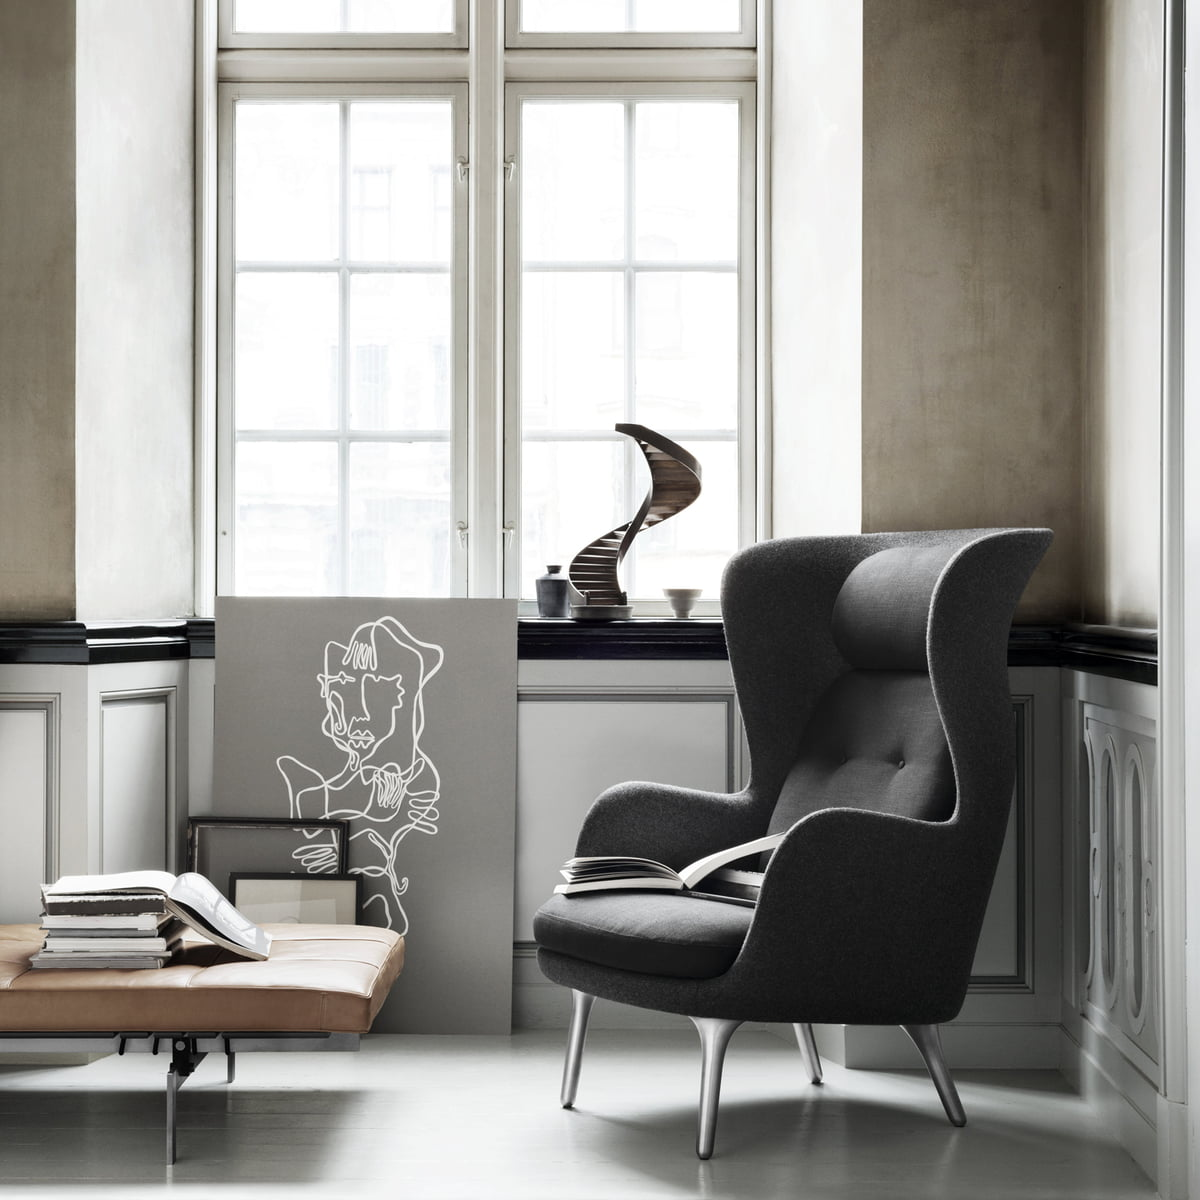 ro armchair by fritz hansen connox - Bergroe Sessel Chaiselongue